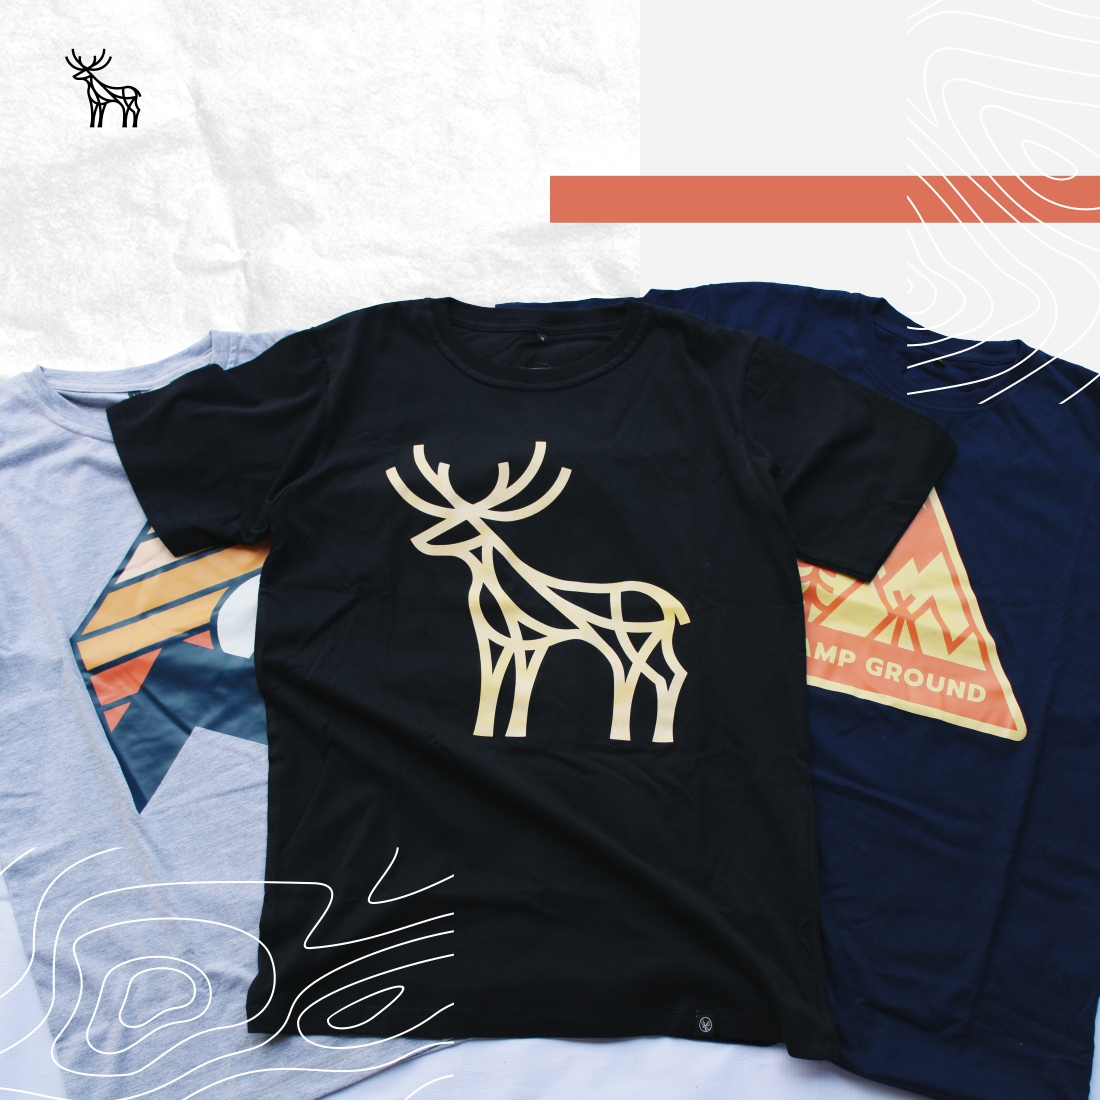 T-Shirt Cap Kijang Dari Tumuju.co